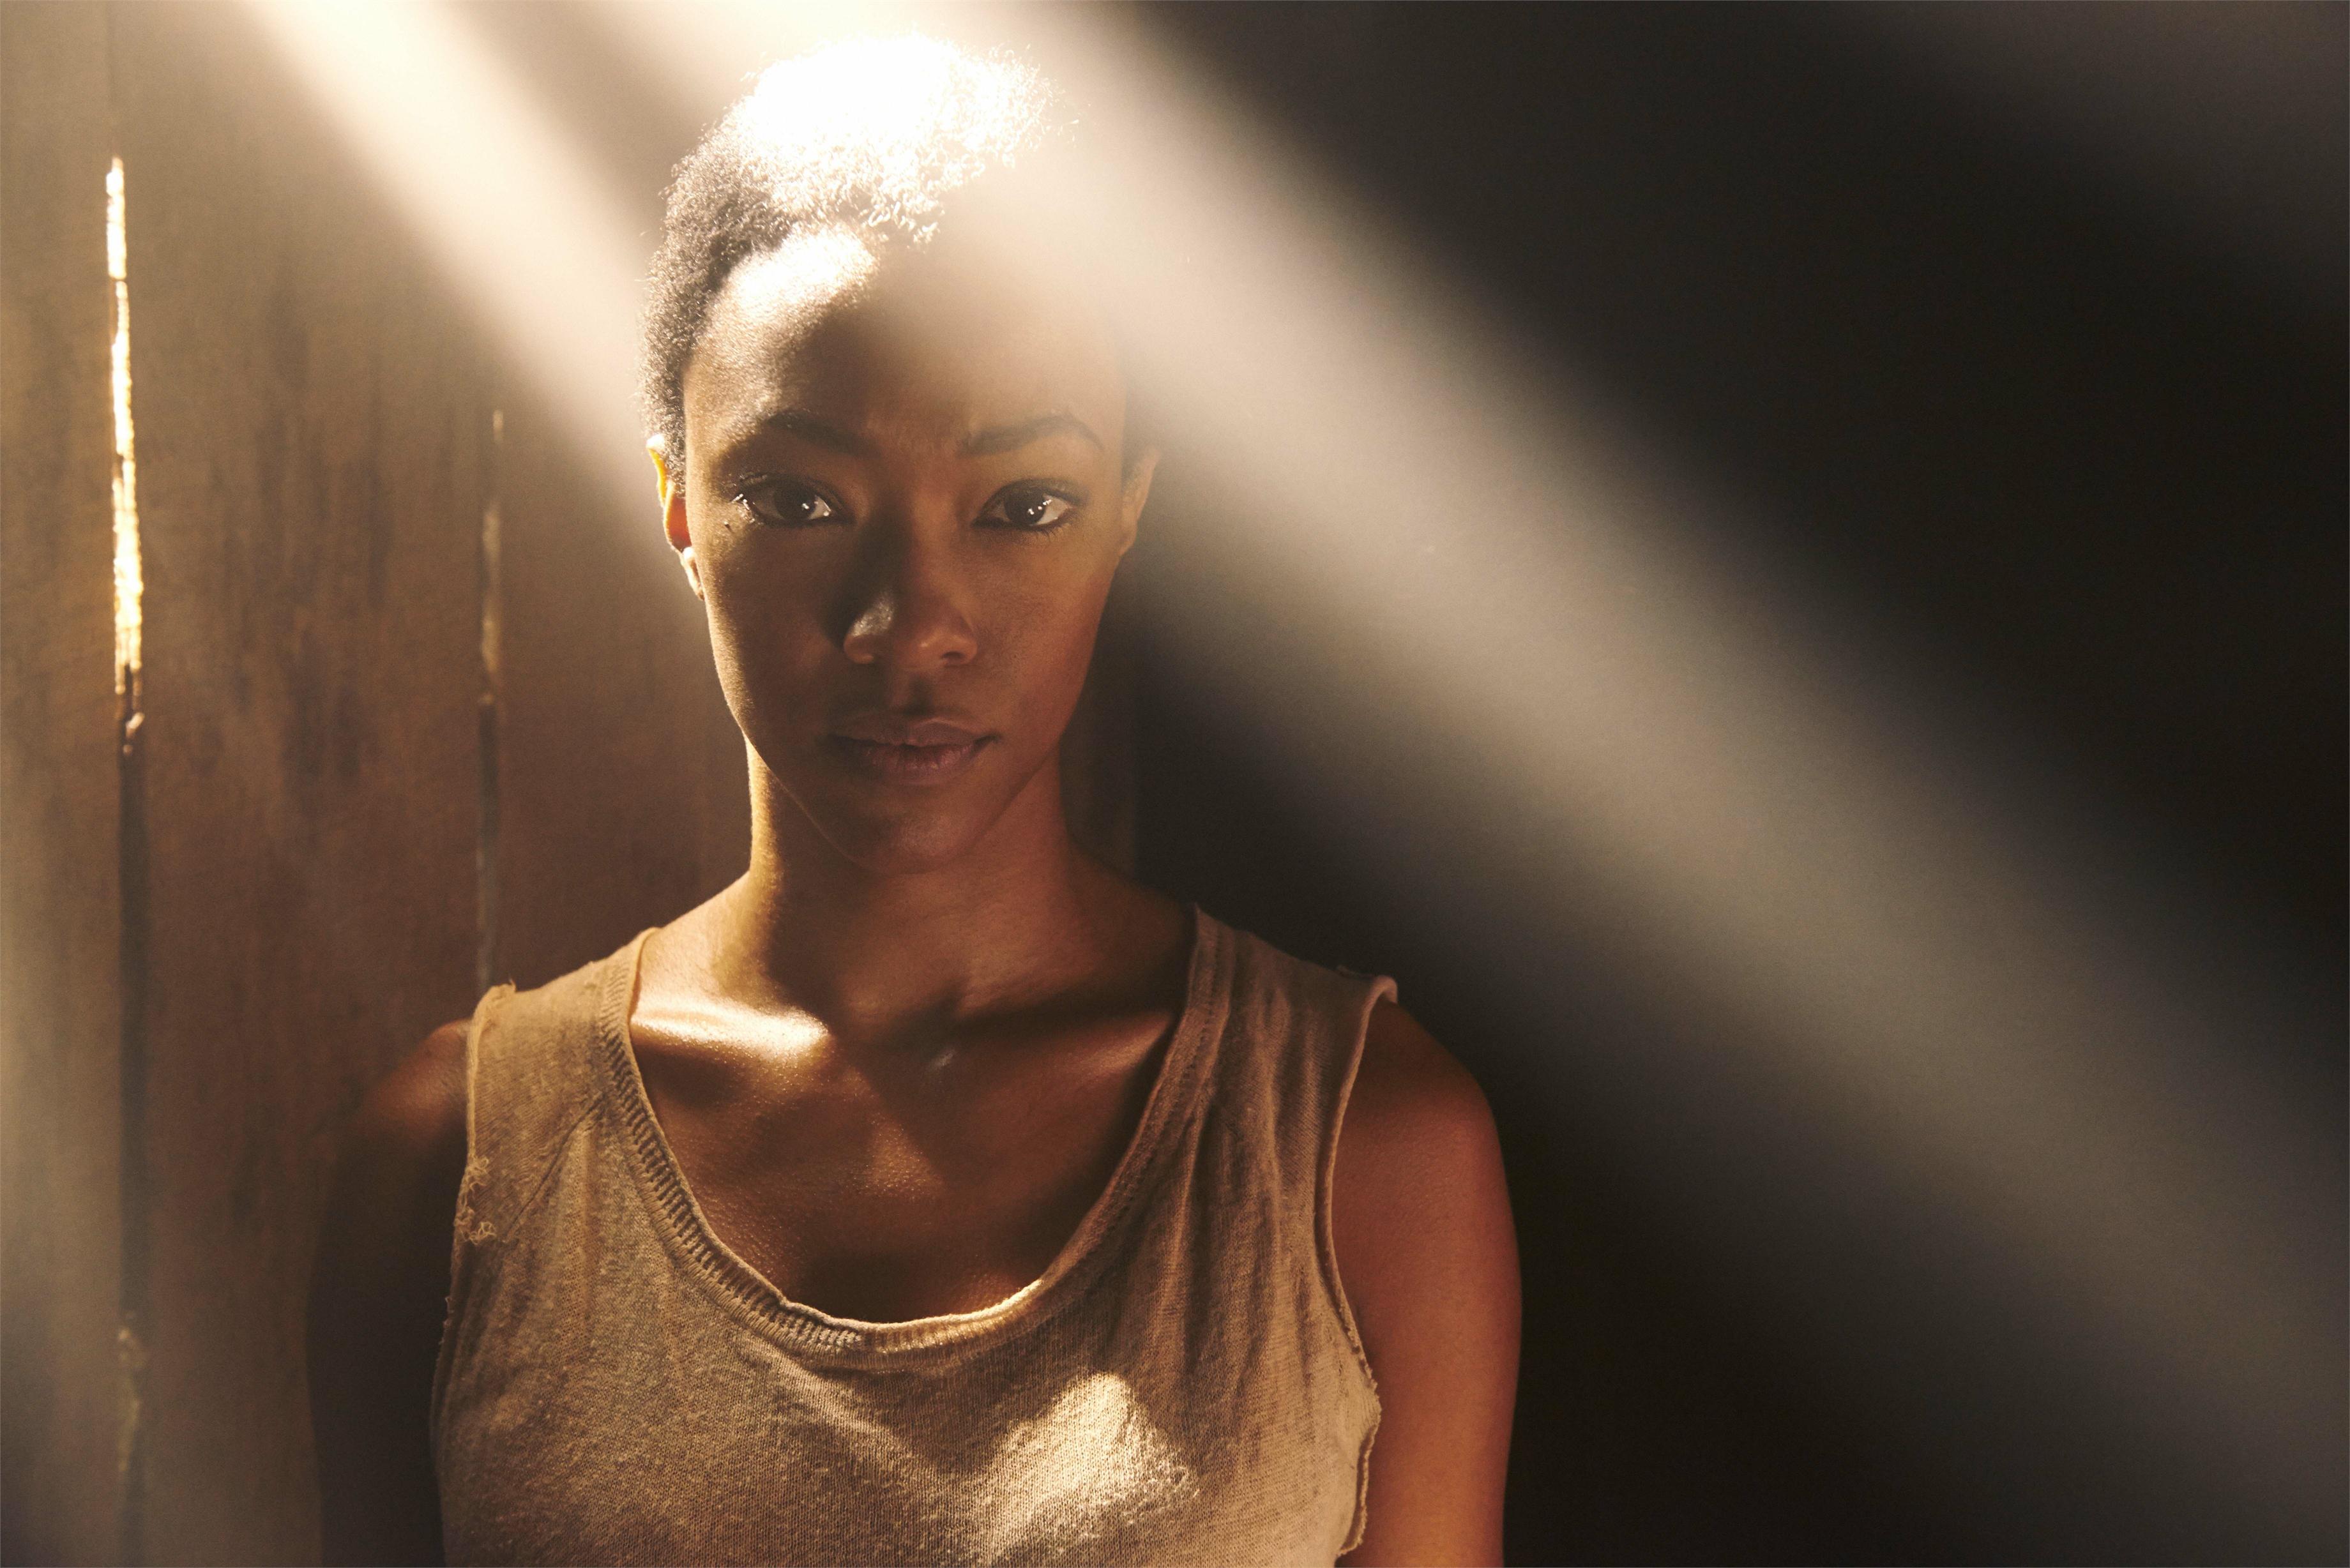 Sasha-The-Walking-Dead-5-Temporada-Personagens-HQ-008